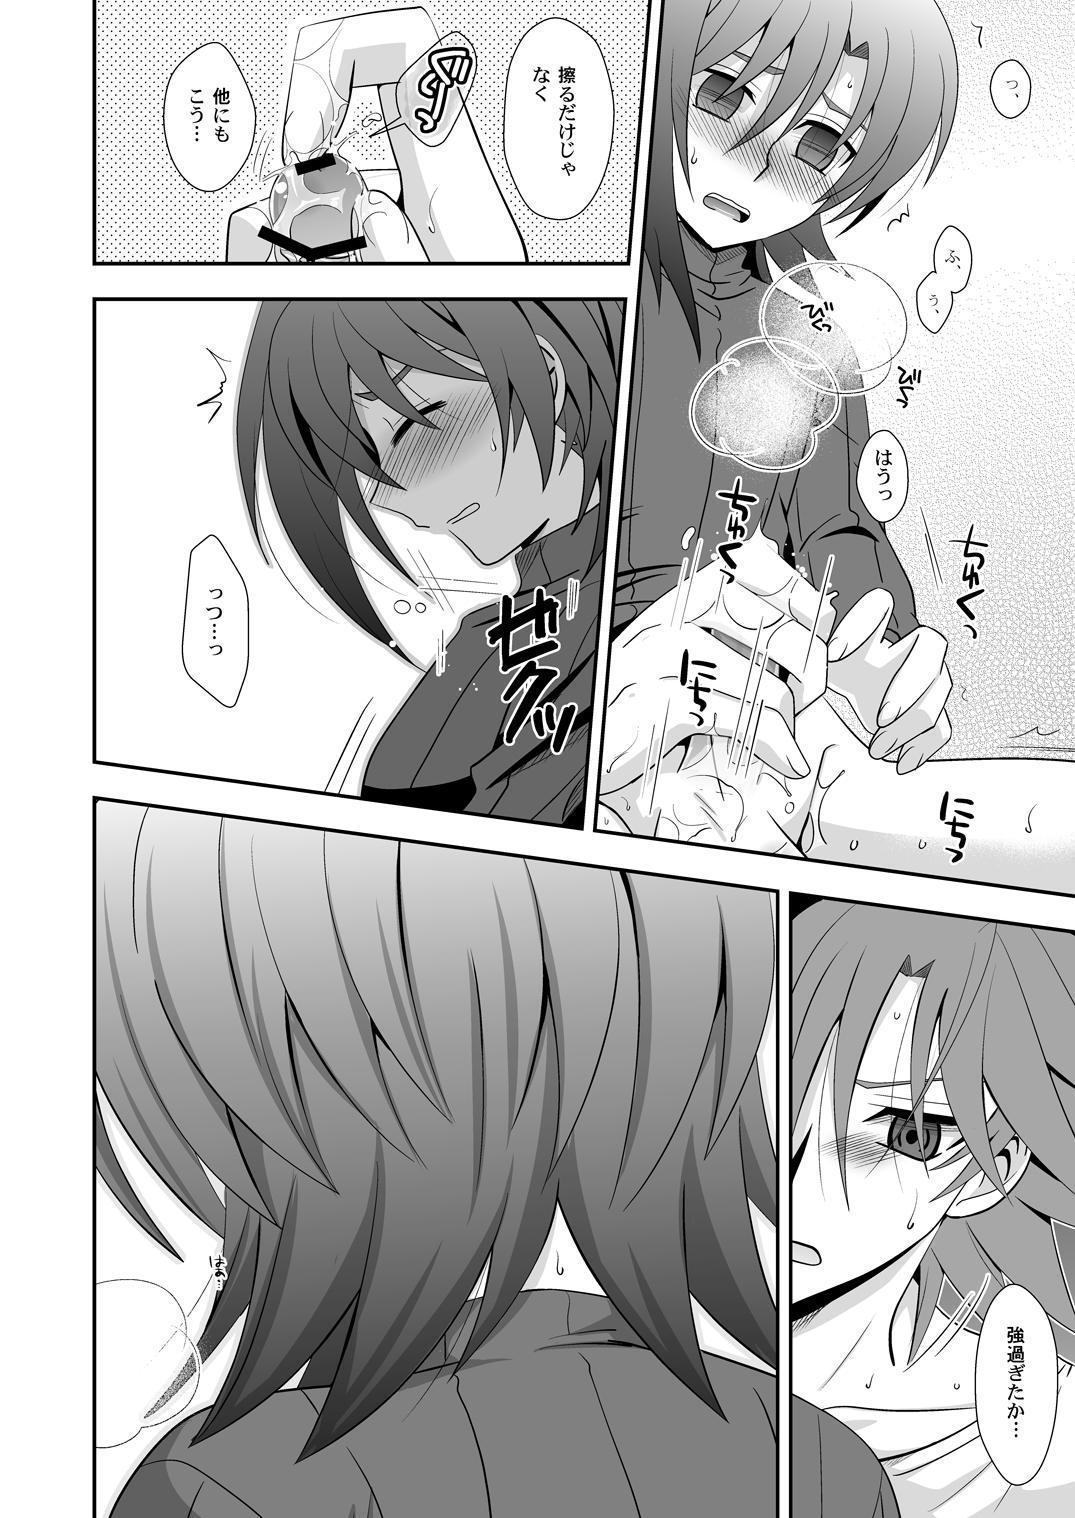 Toshiki mada 1○ dakara 8